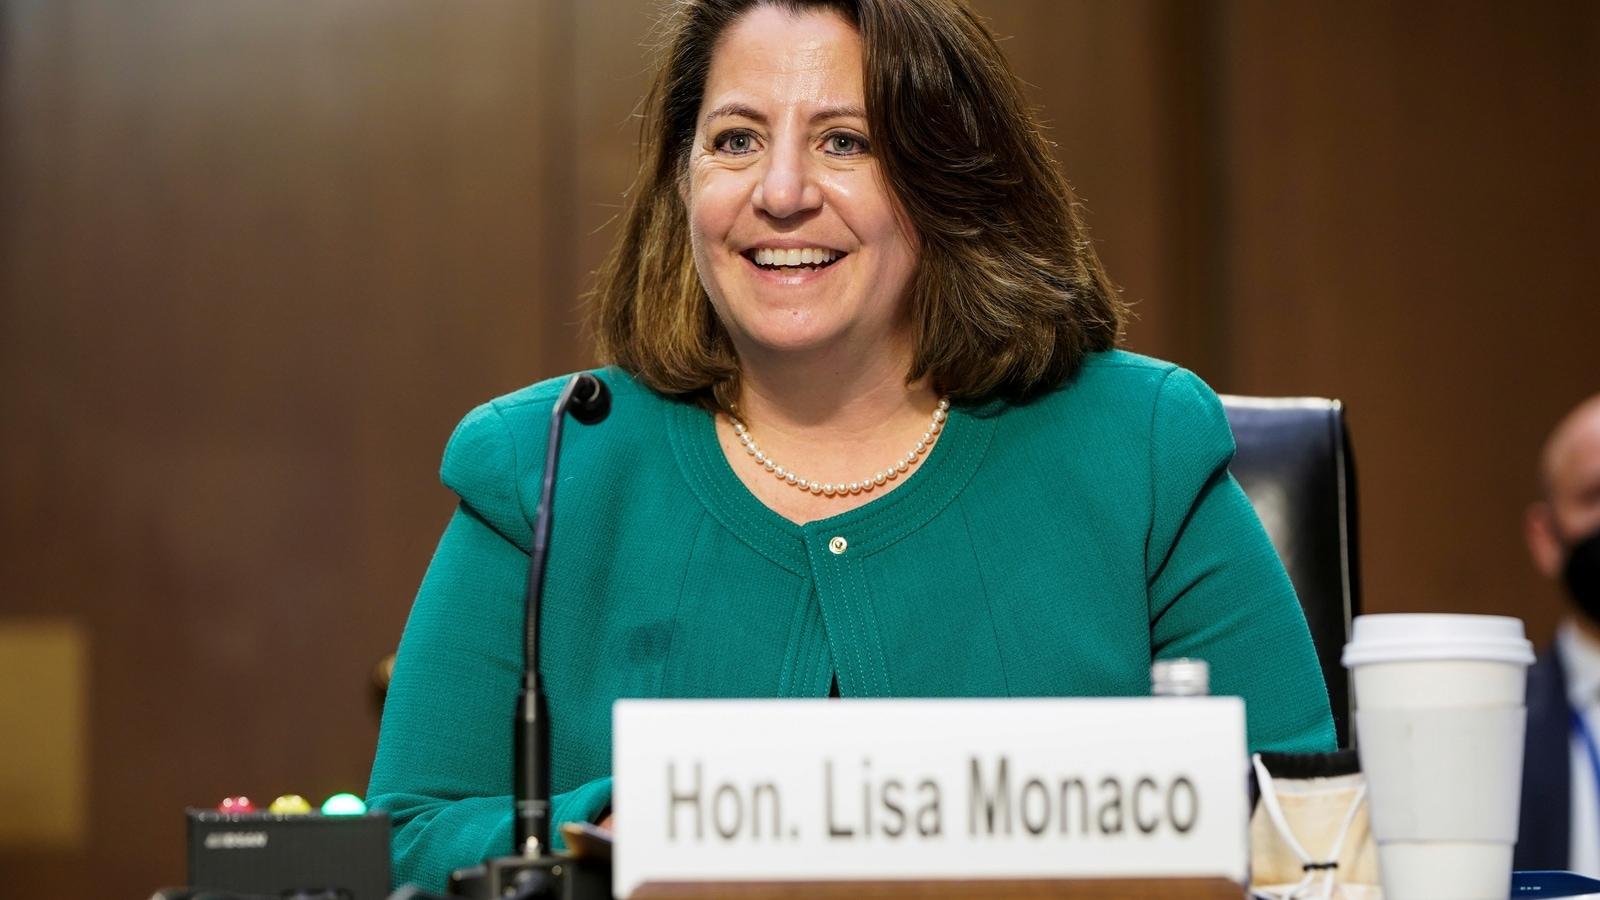 Biden pick Lisa Monaco wins Senate confirmation for no. 2 at DOJ |  Hindustan Times